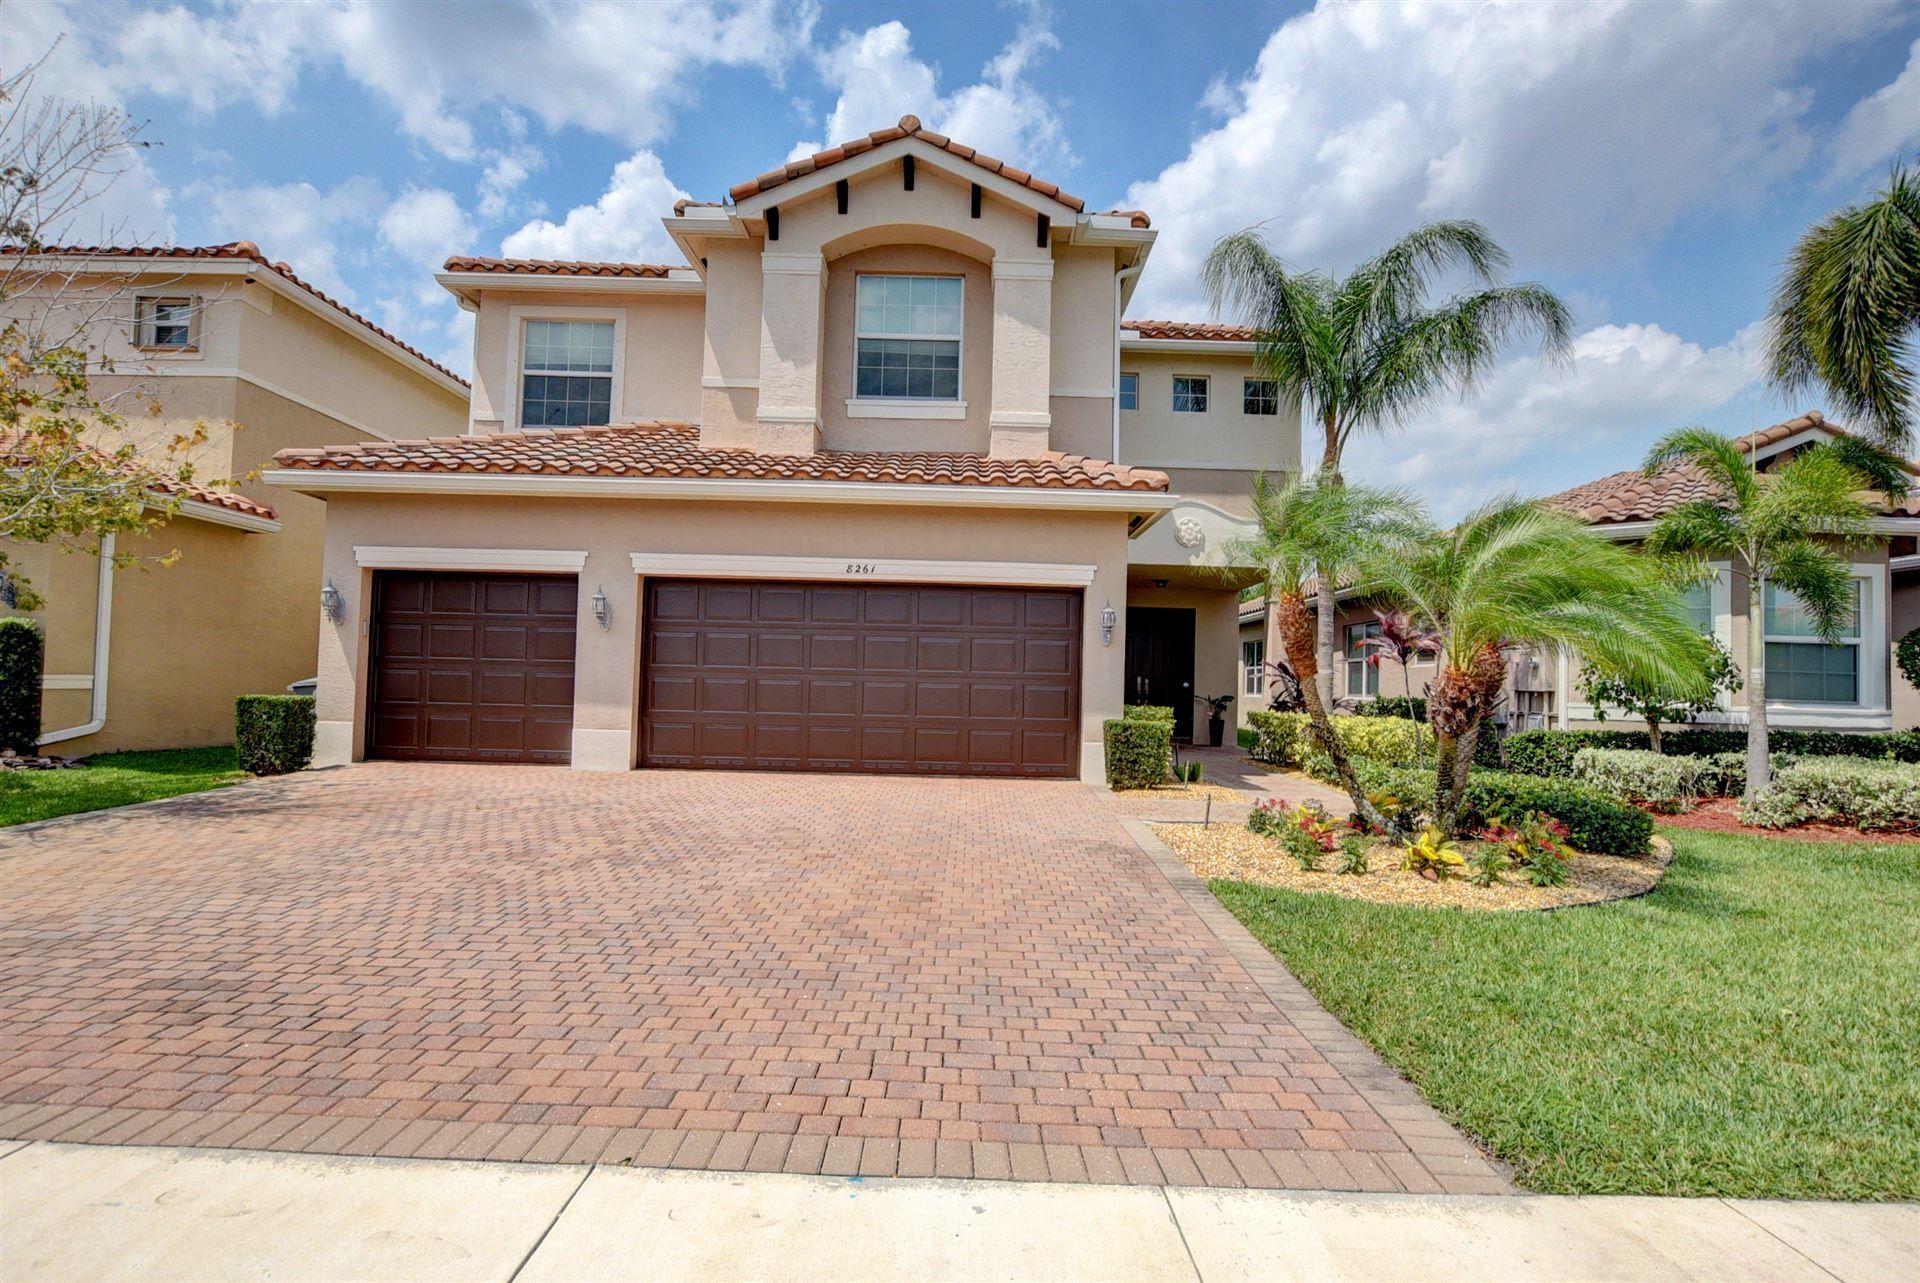 8261 Savara Streams Lane, Boynton Beach, FL 33473 - MLS#: RX-10617166